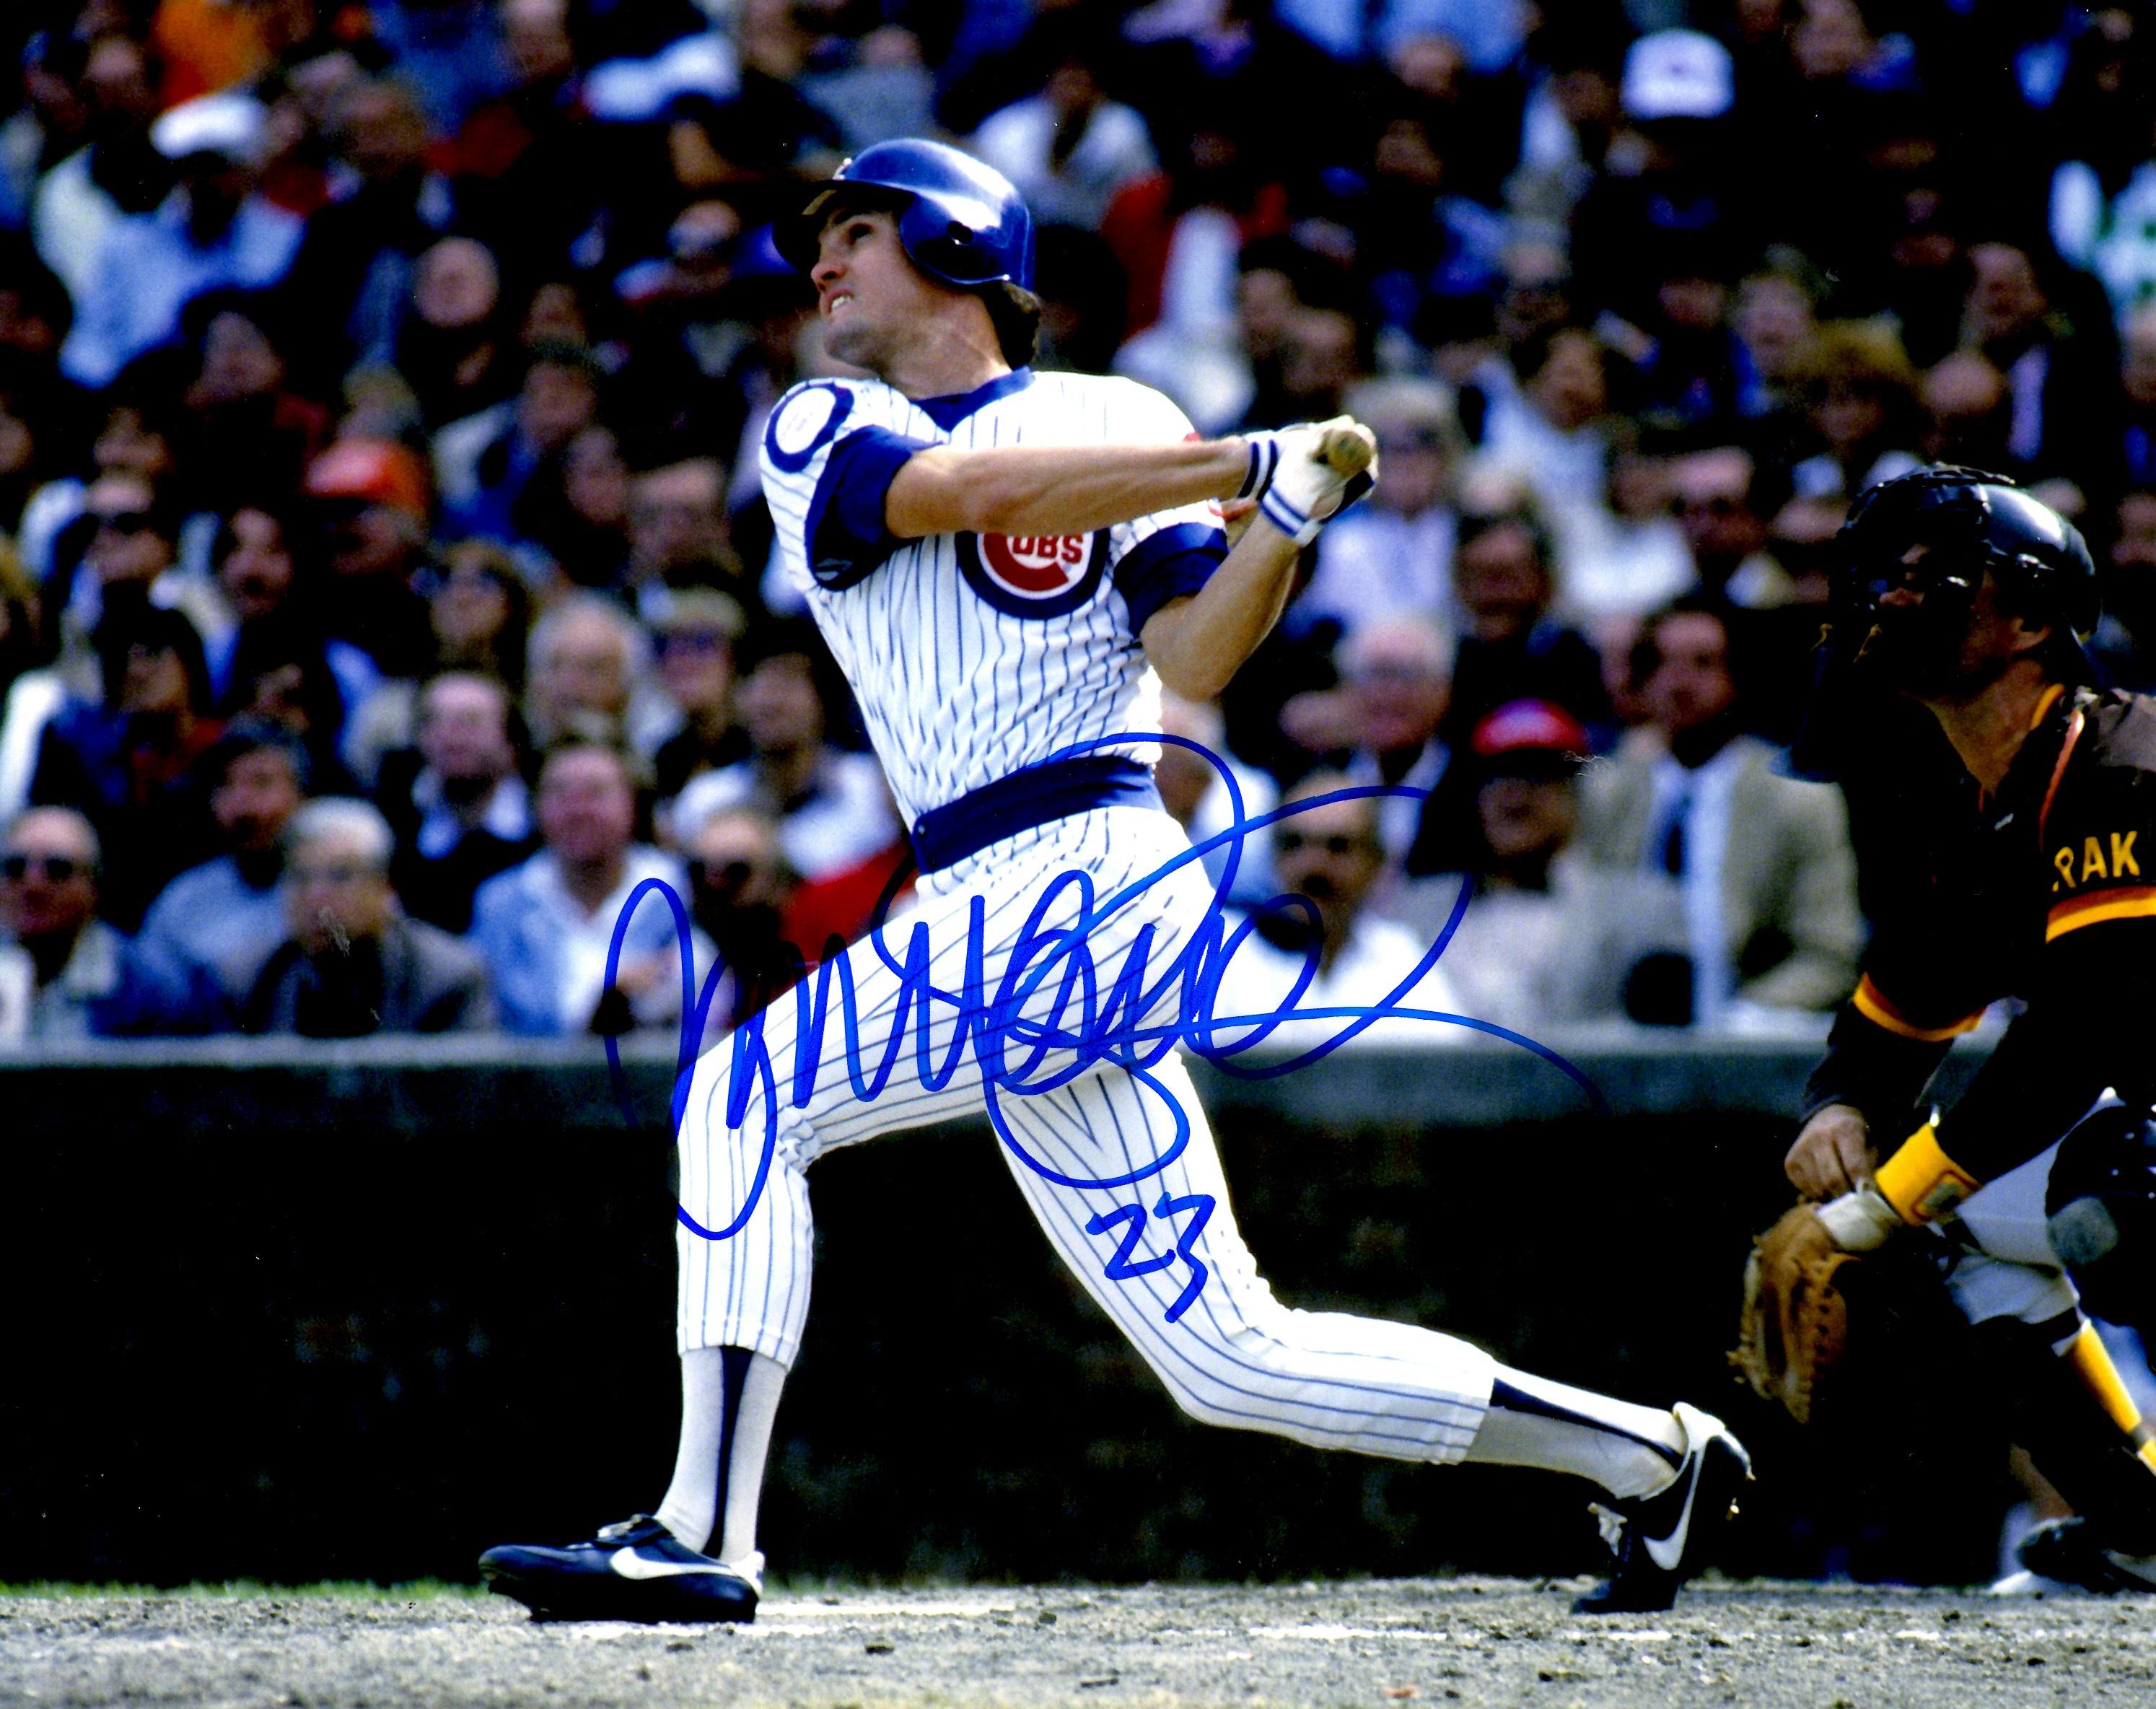 CHICAGO CUBS mlb baseball 29 wallpaper 2988x2368 232537 2988x2368